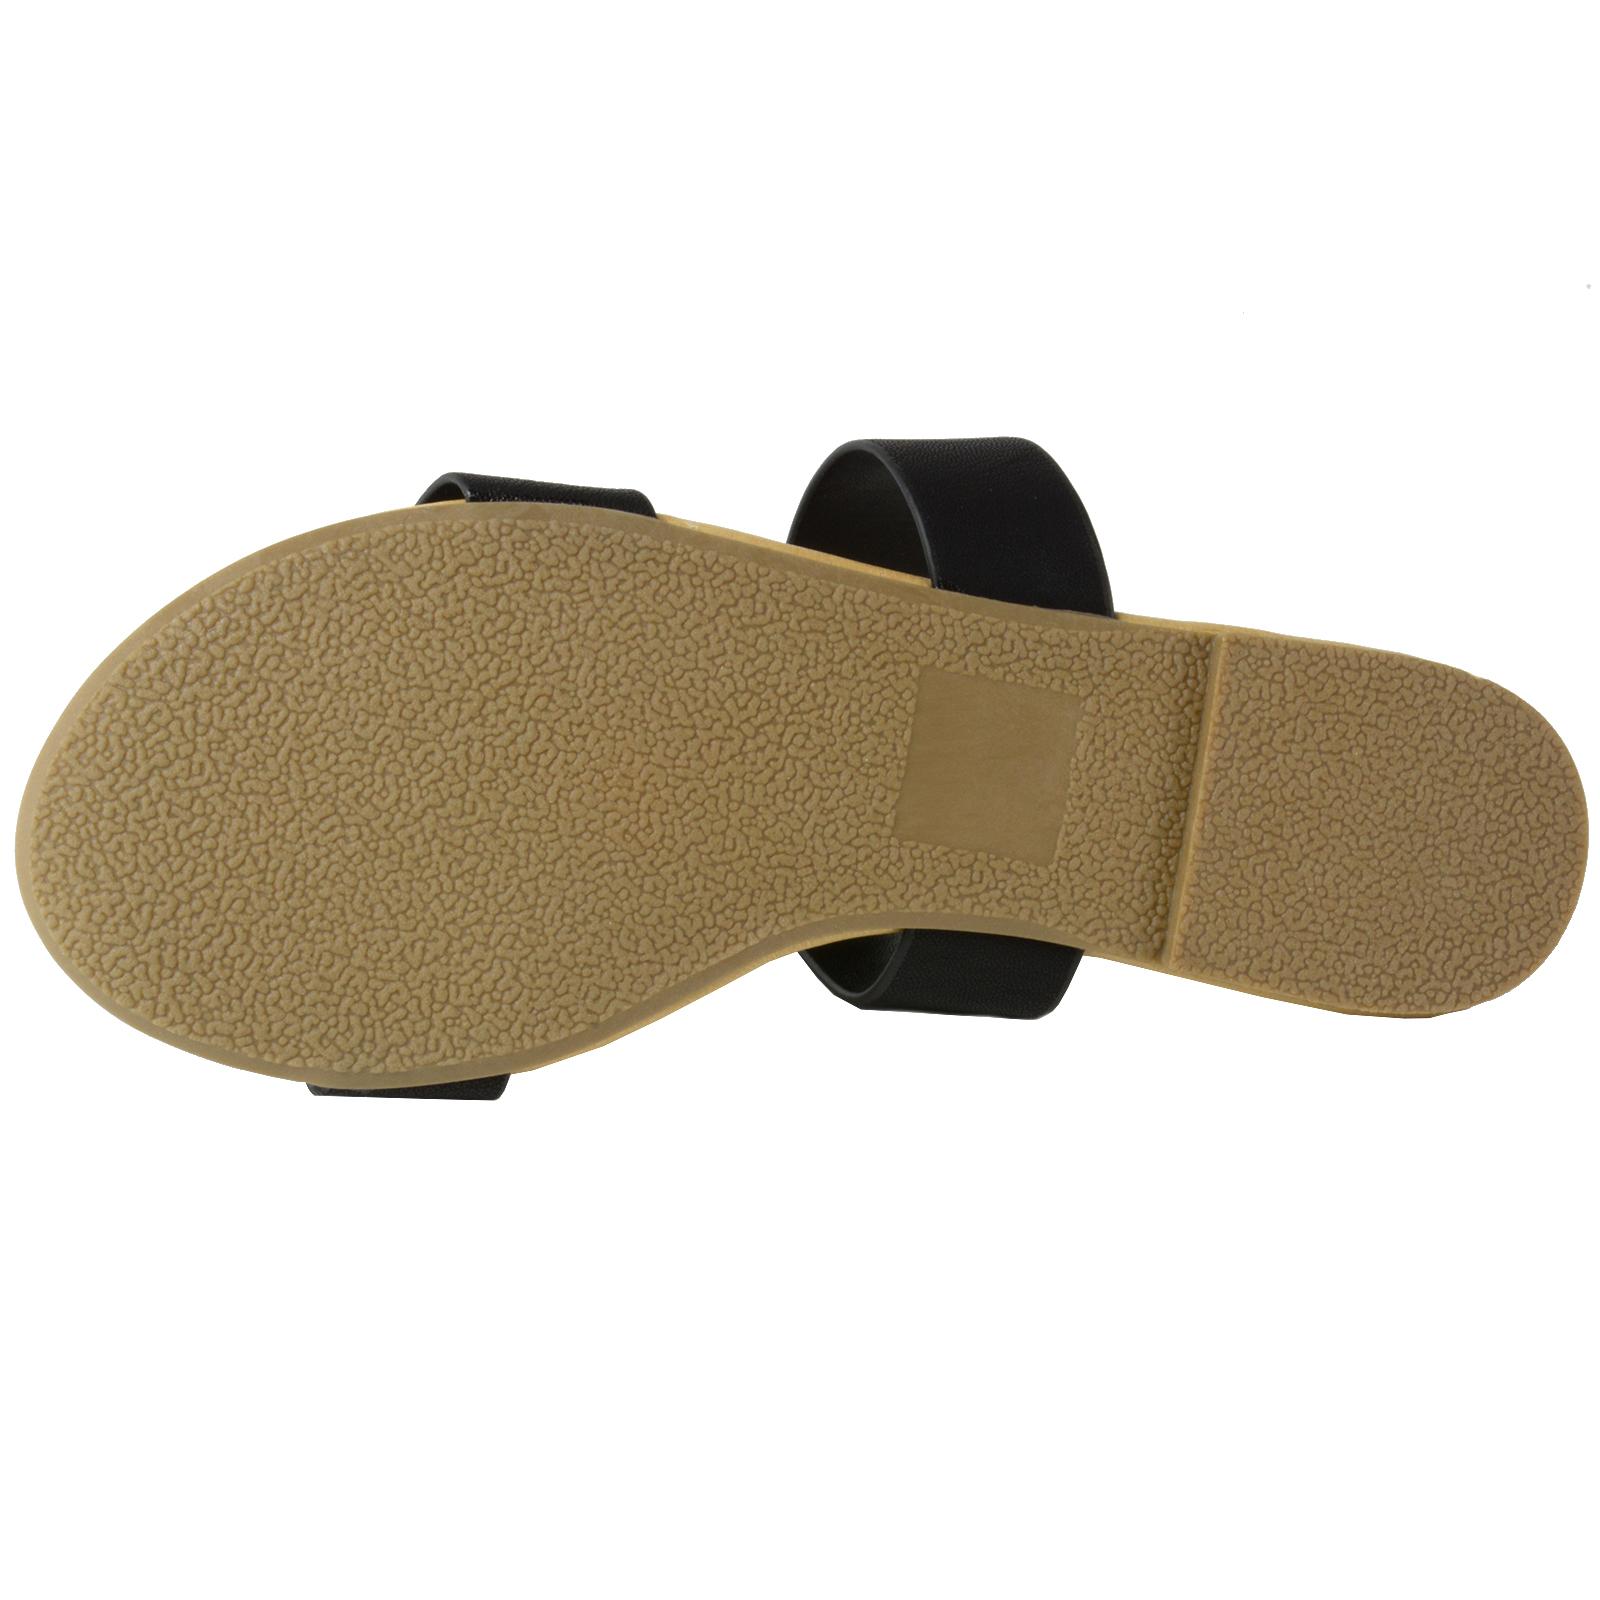 e66297b33 Soda Browse Women s Slides Slip On Flat Summer Shoes Double Strap ...